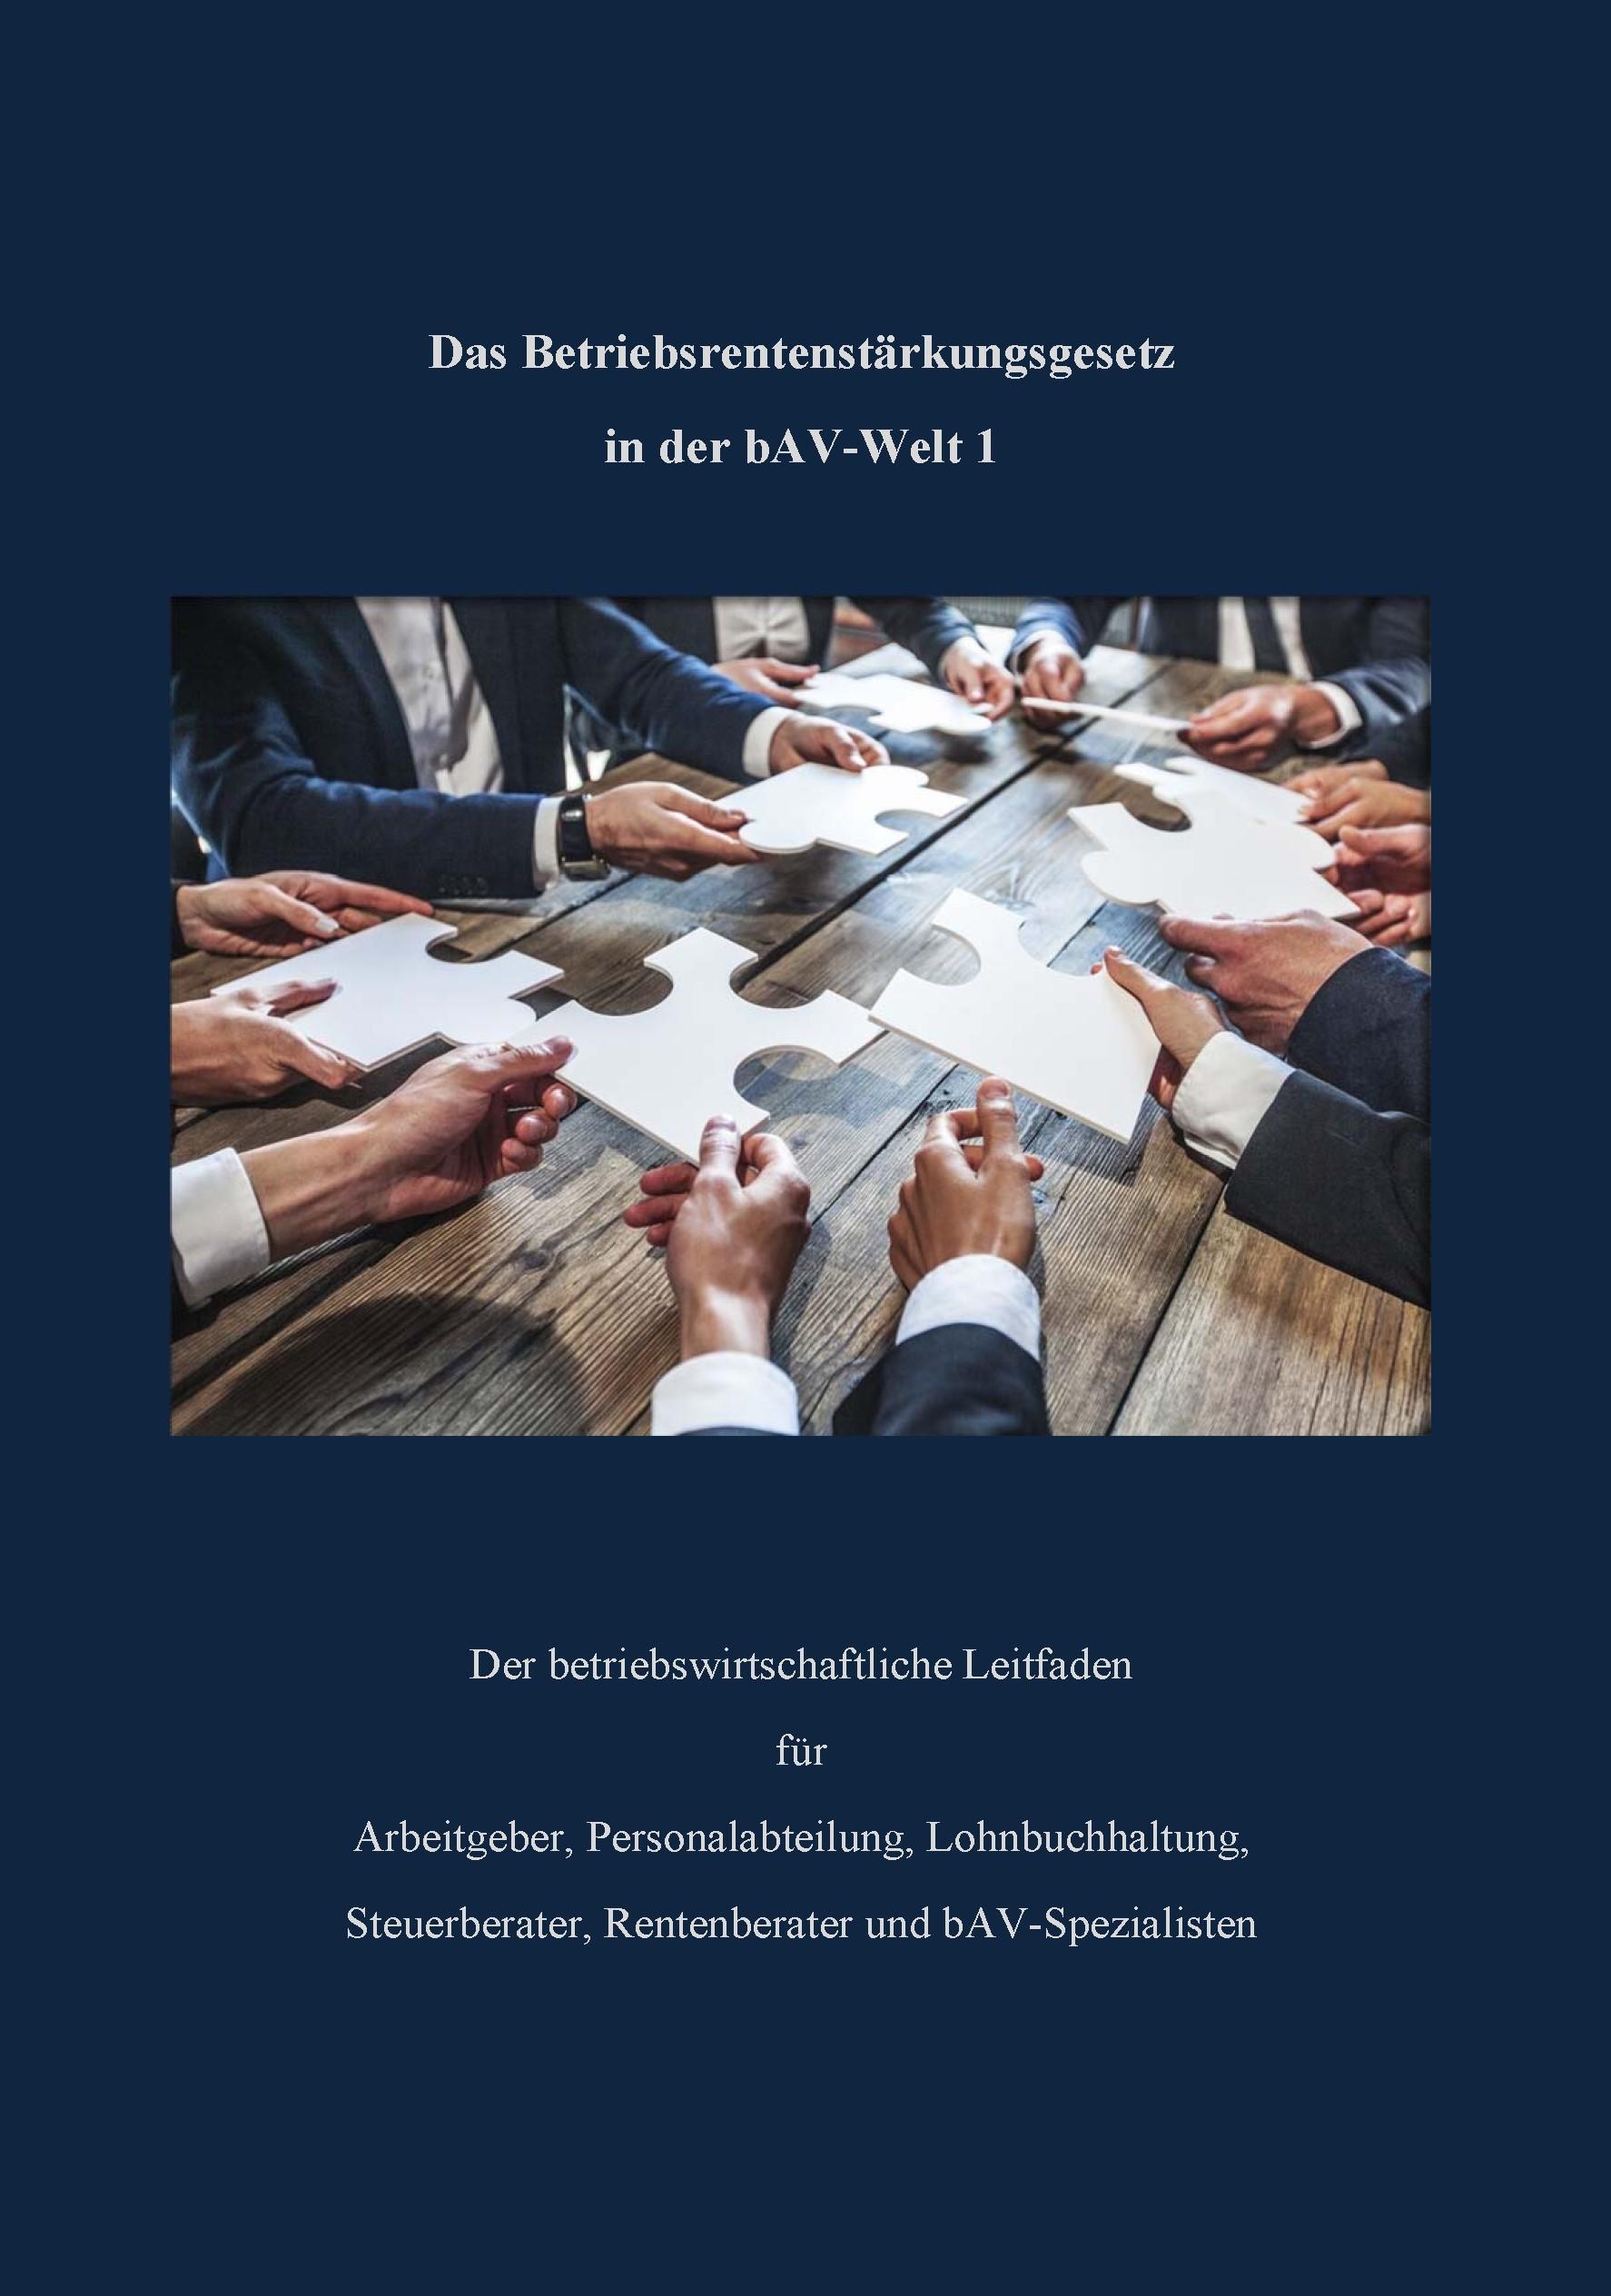 bAV Leitfaden für Arbeitgeber, Personalabteilung, HR-Berater, Steuerberater